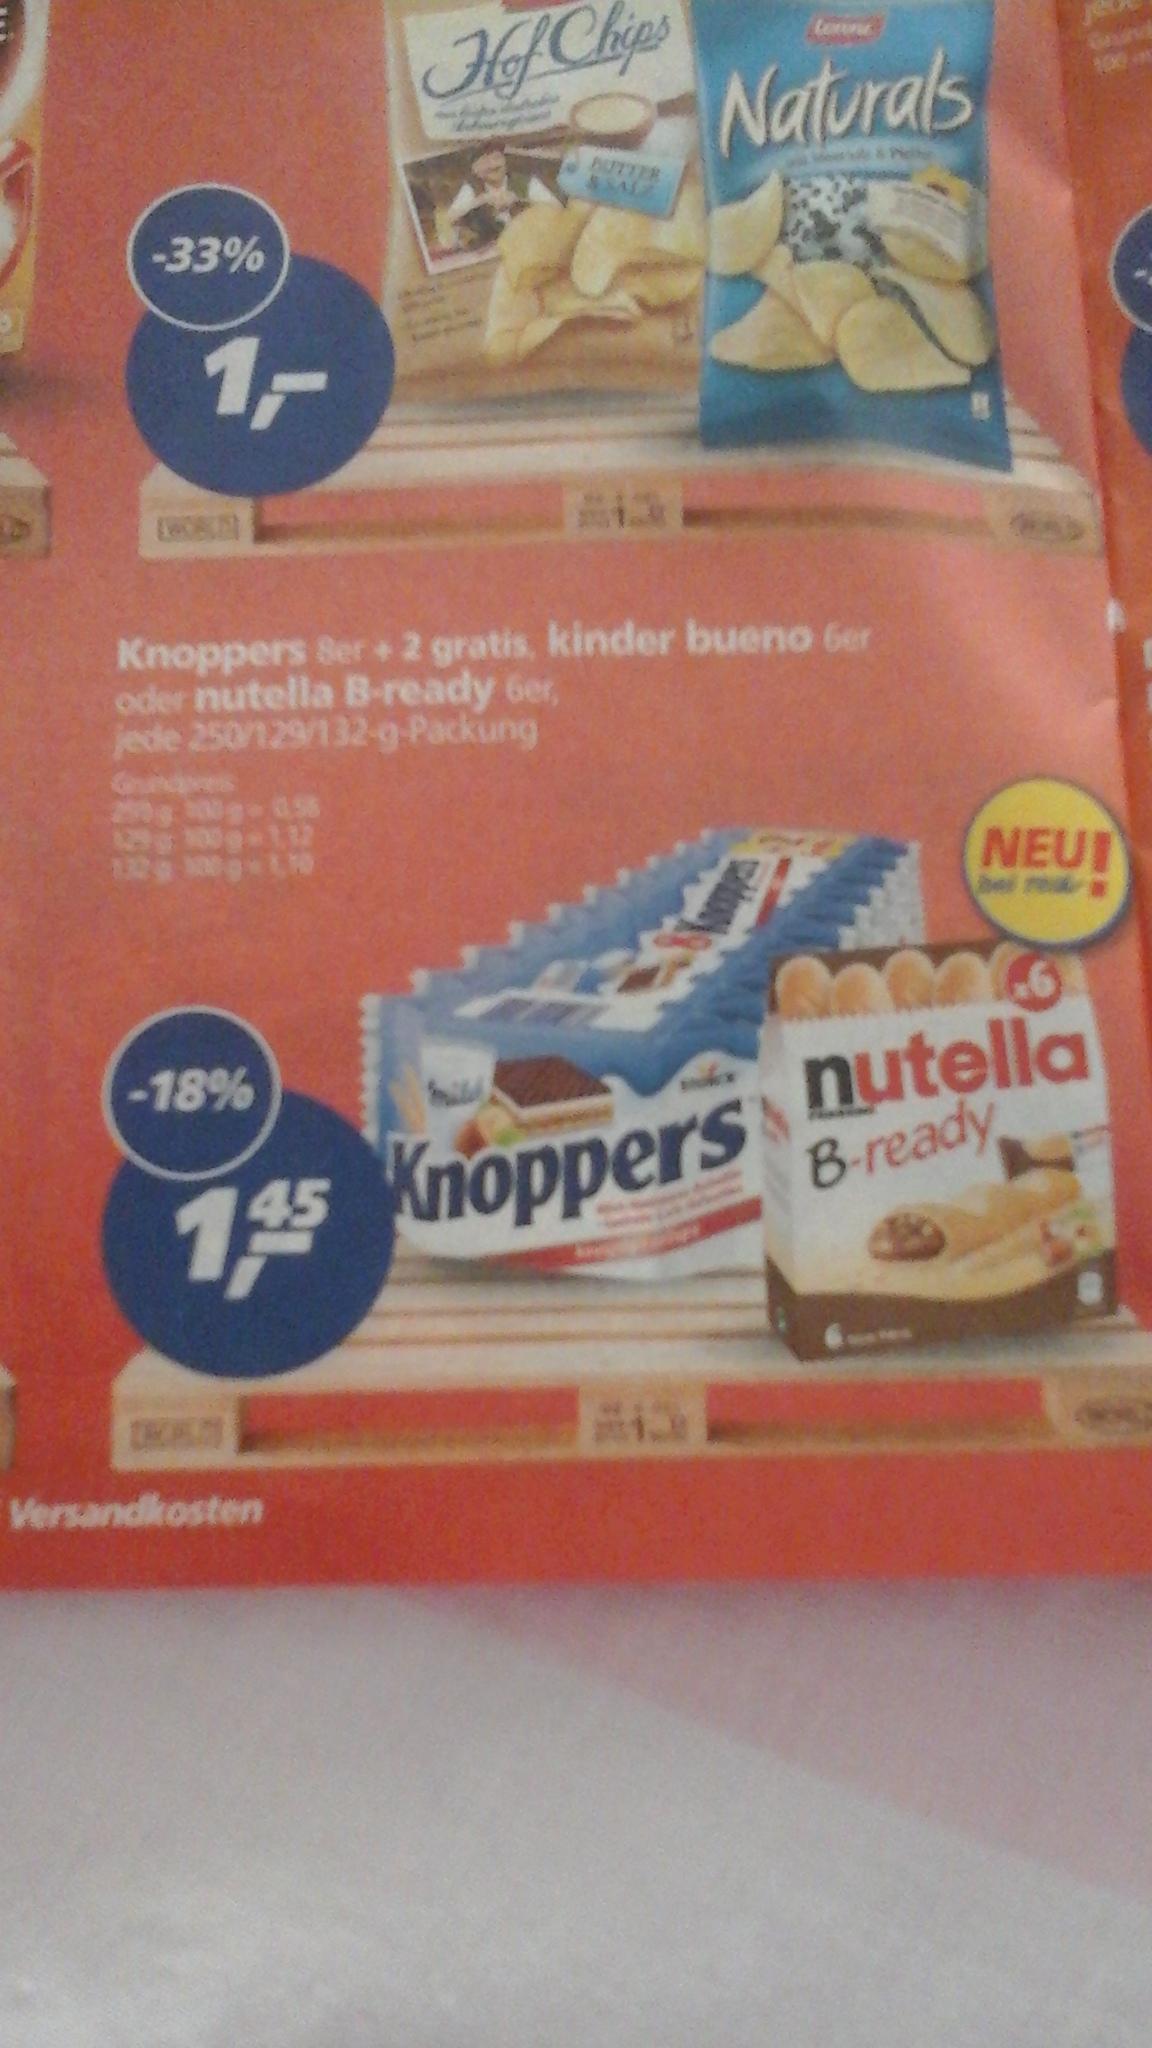 Nutella B-ready ,Kinderbueno,Knoppers für 1,45€